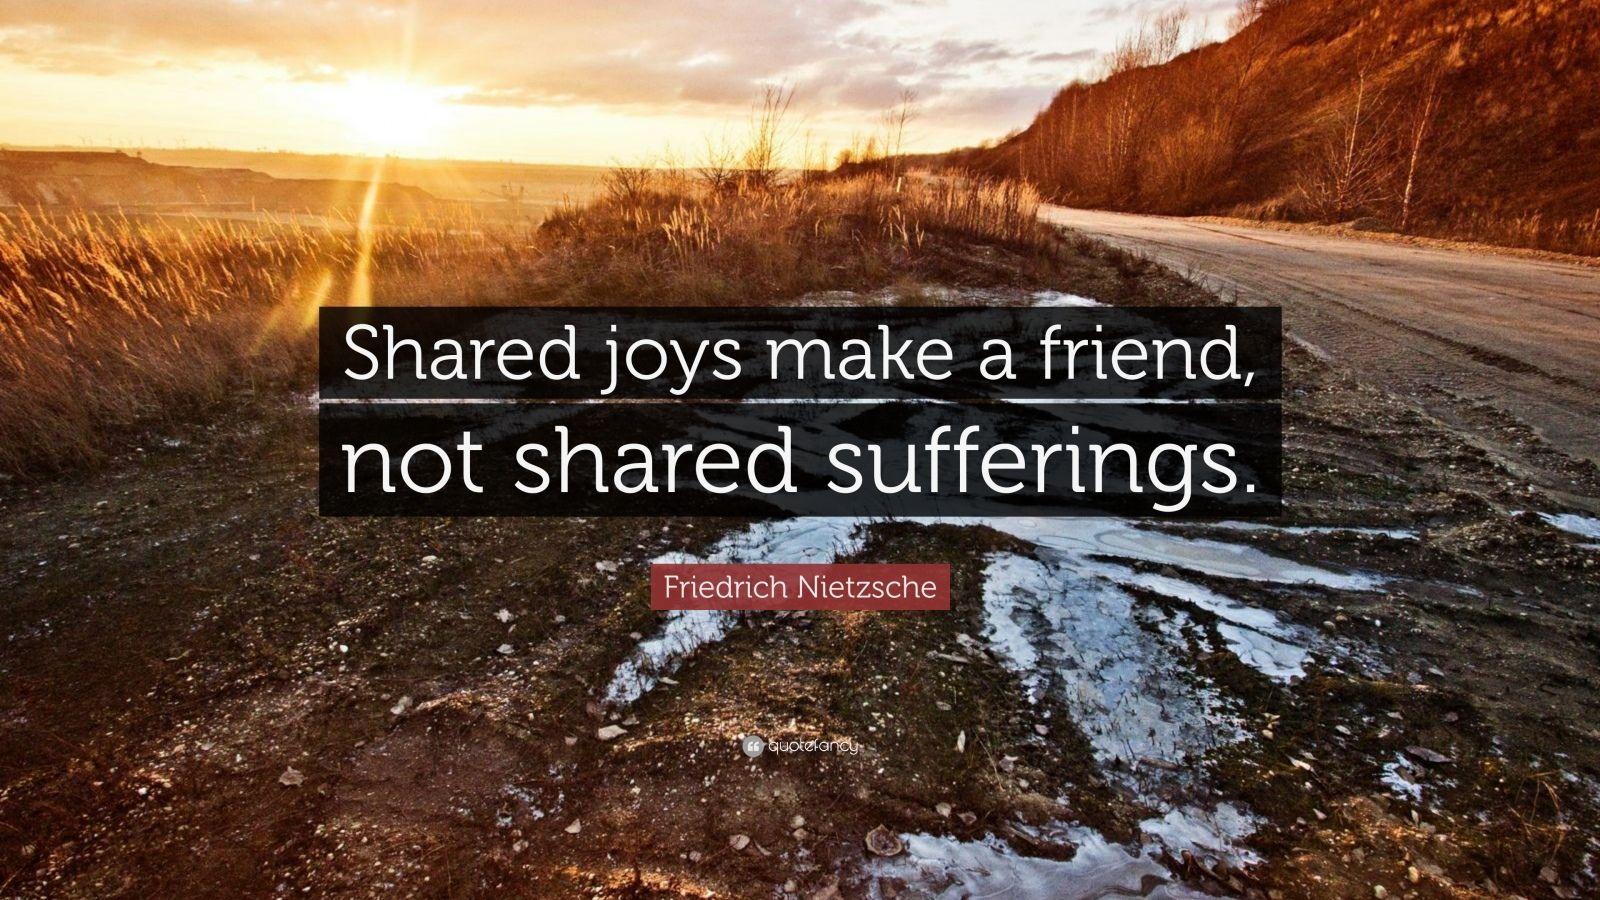 Shared joys make a friend, not shared sufferings.